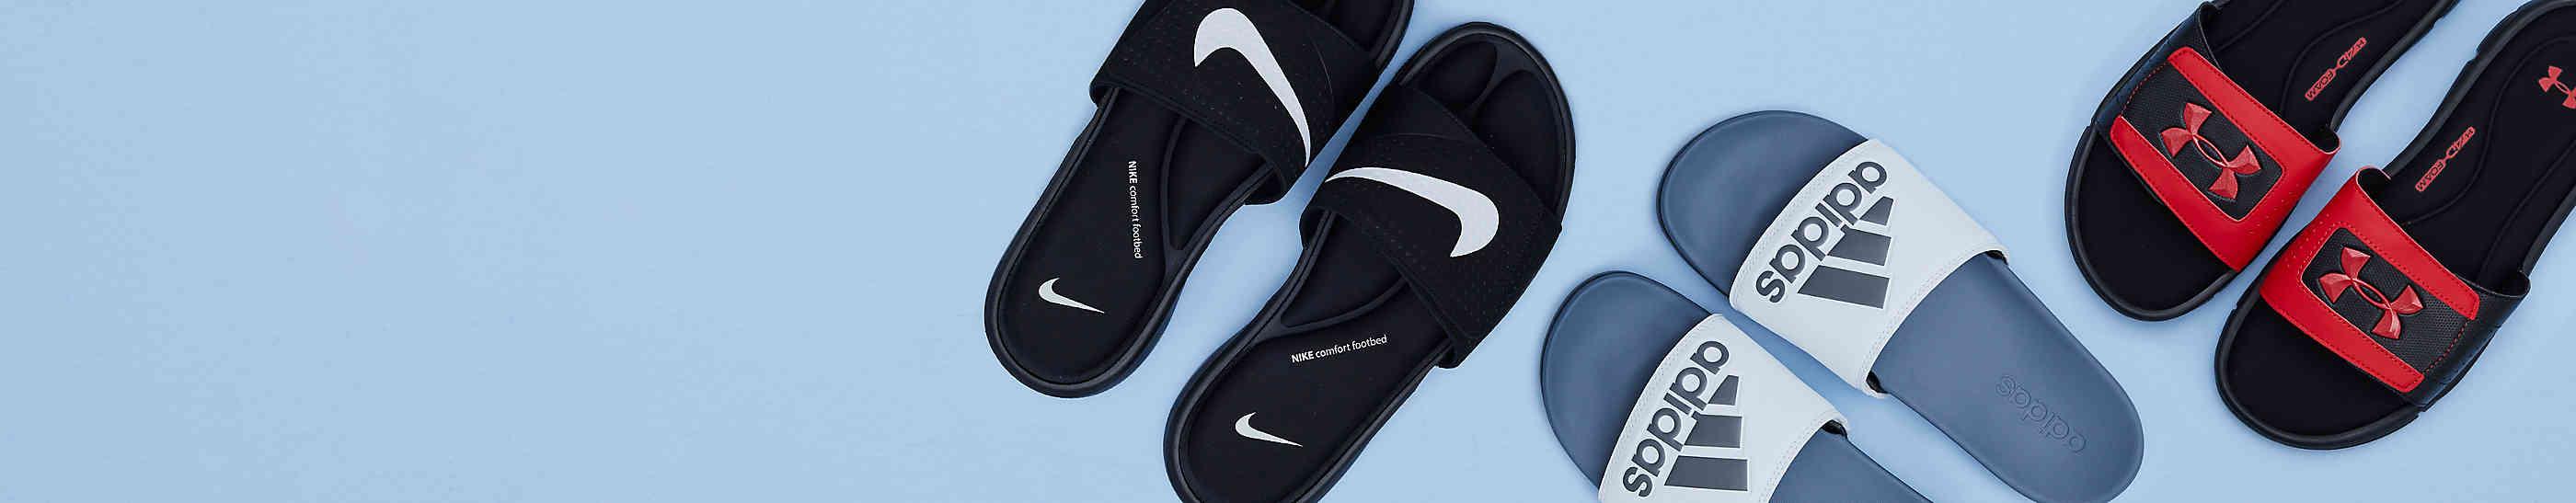 itm thongs beach comfort most sole mens comforter flops lightweight flip swiss eva men alpine comfortable bge for sandals s